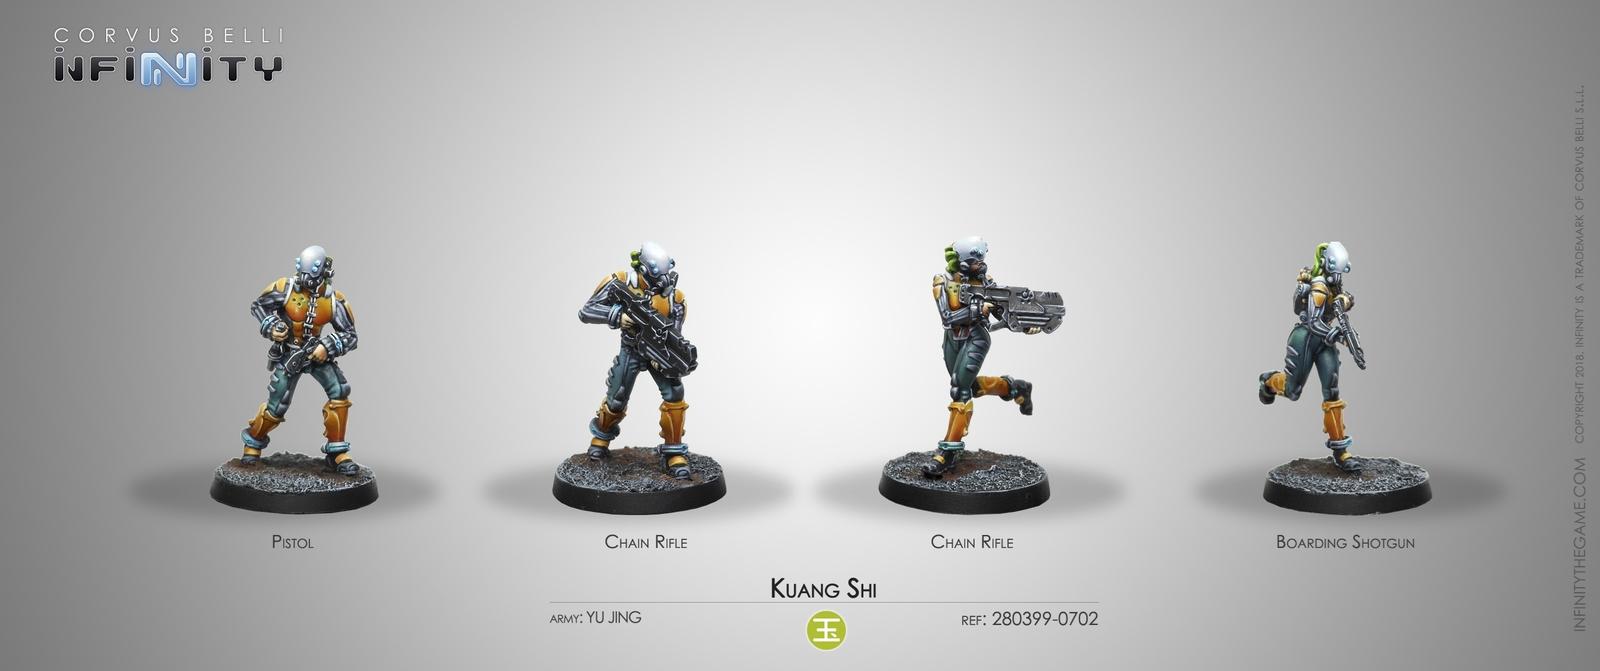 2 Hacker // HMG Corvus Belli Infinity Yu Jing: Hac Tao Special Unit #682